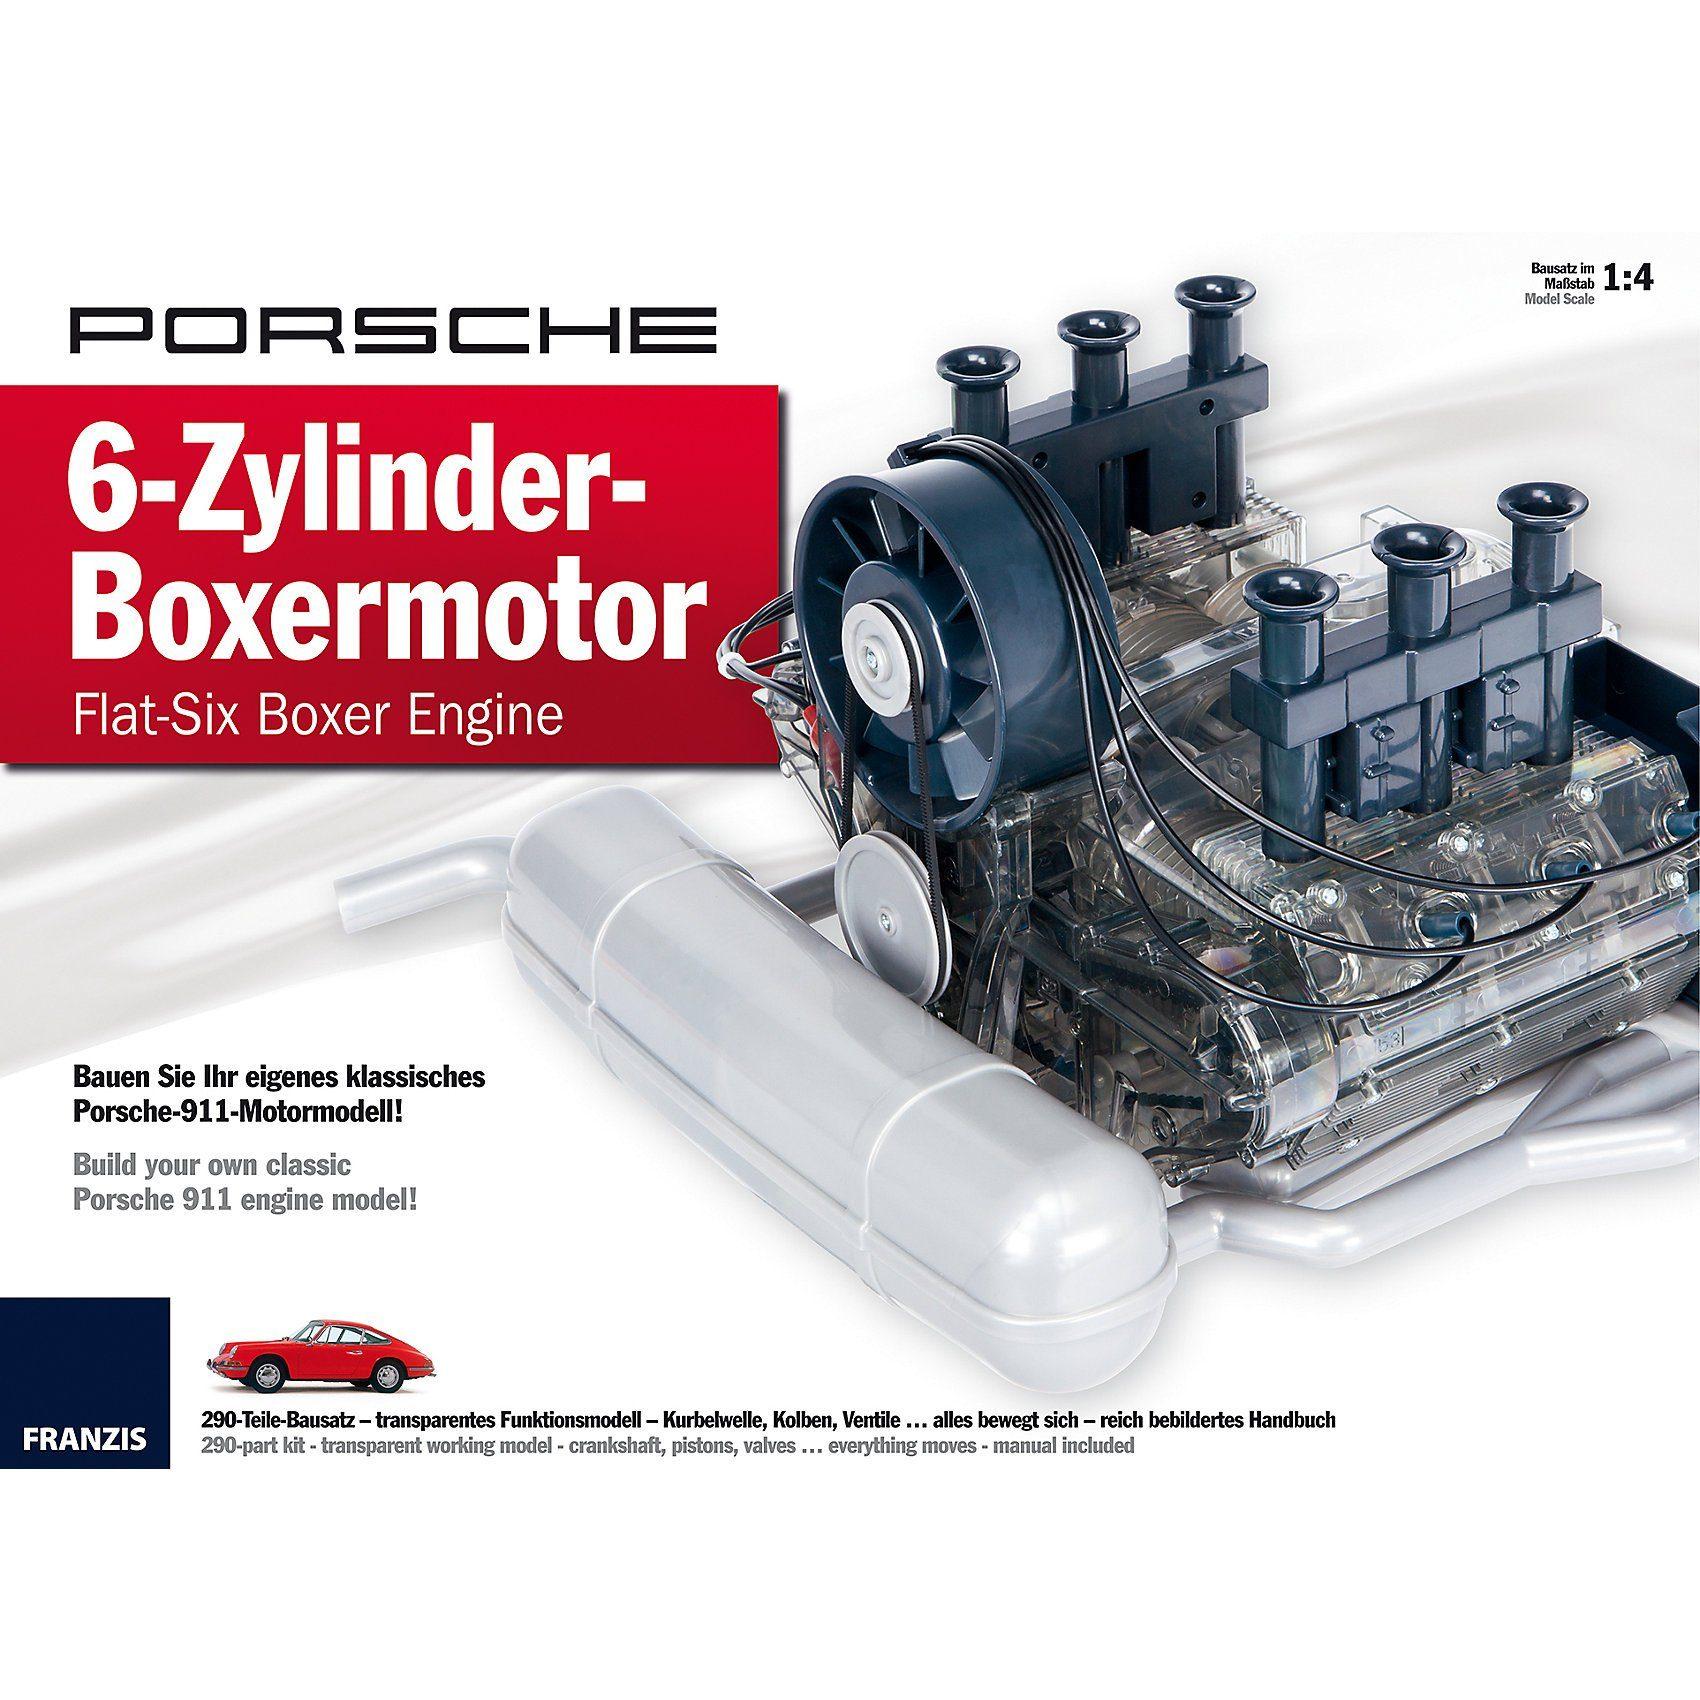 Franzis - Porsche 6-Zylinder-Boxermotor